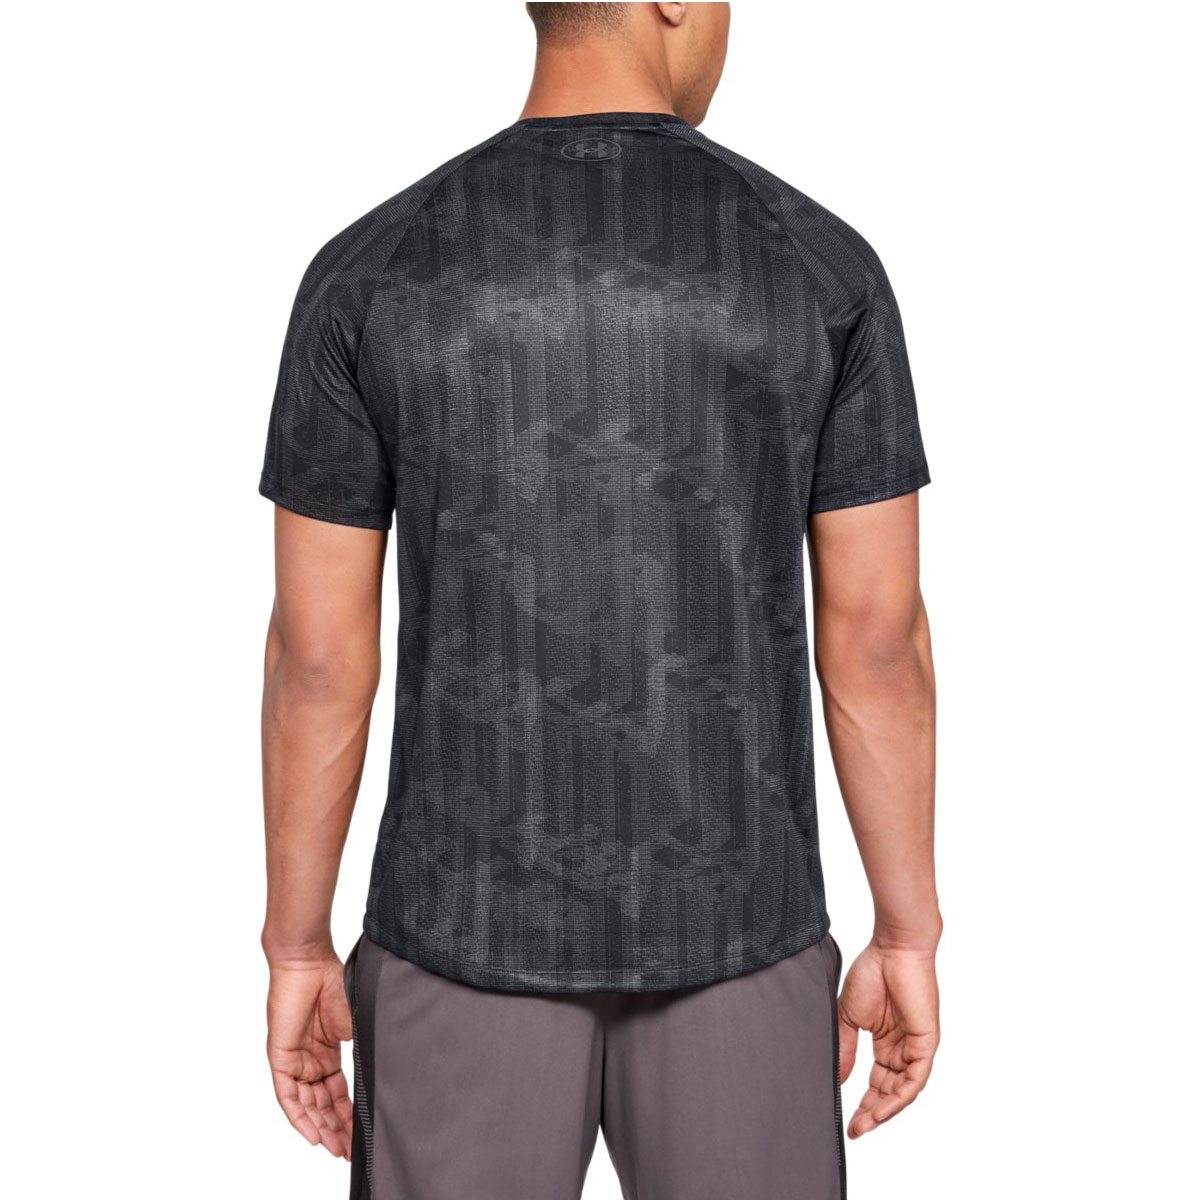 Under-Armour-Mens-UA-Tech-SS-Printed-Moisture-Wicking-T-Shirt-Tee-27-OFF-RRP thumbnail 3